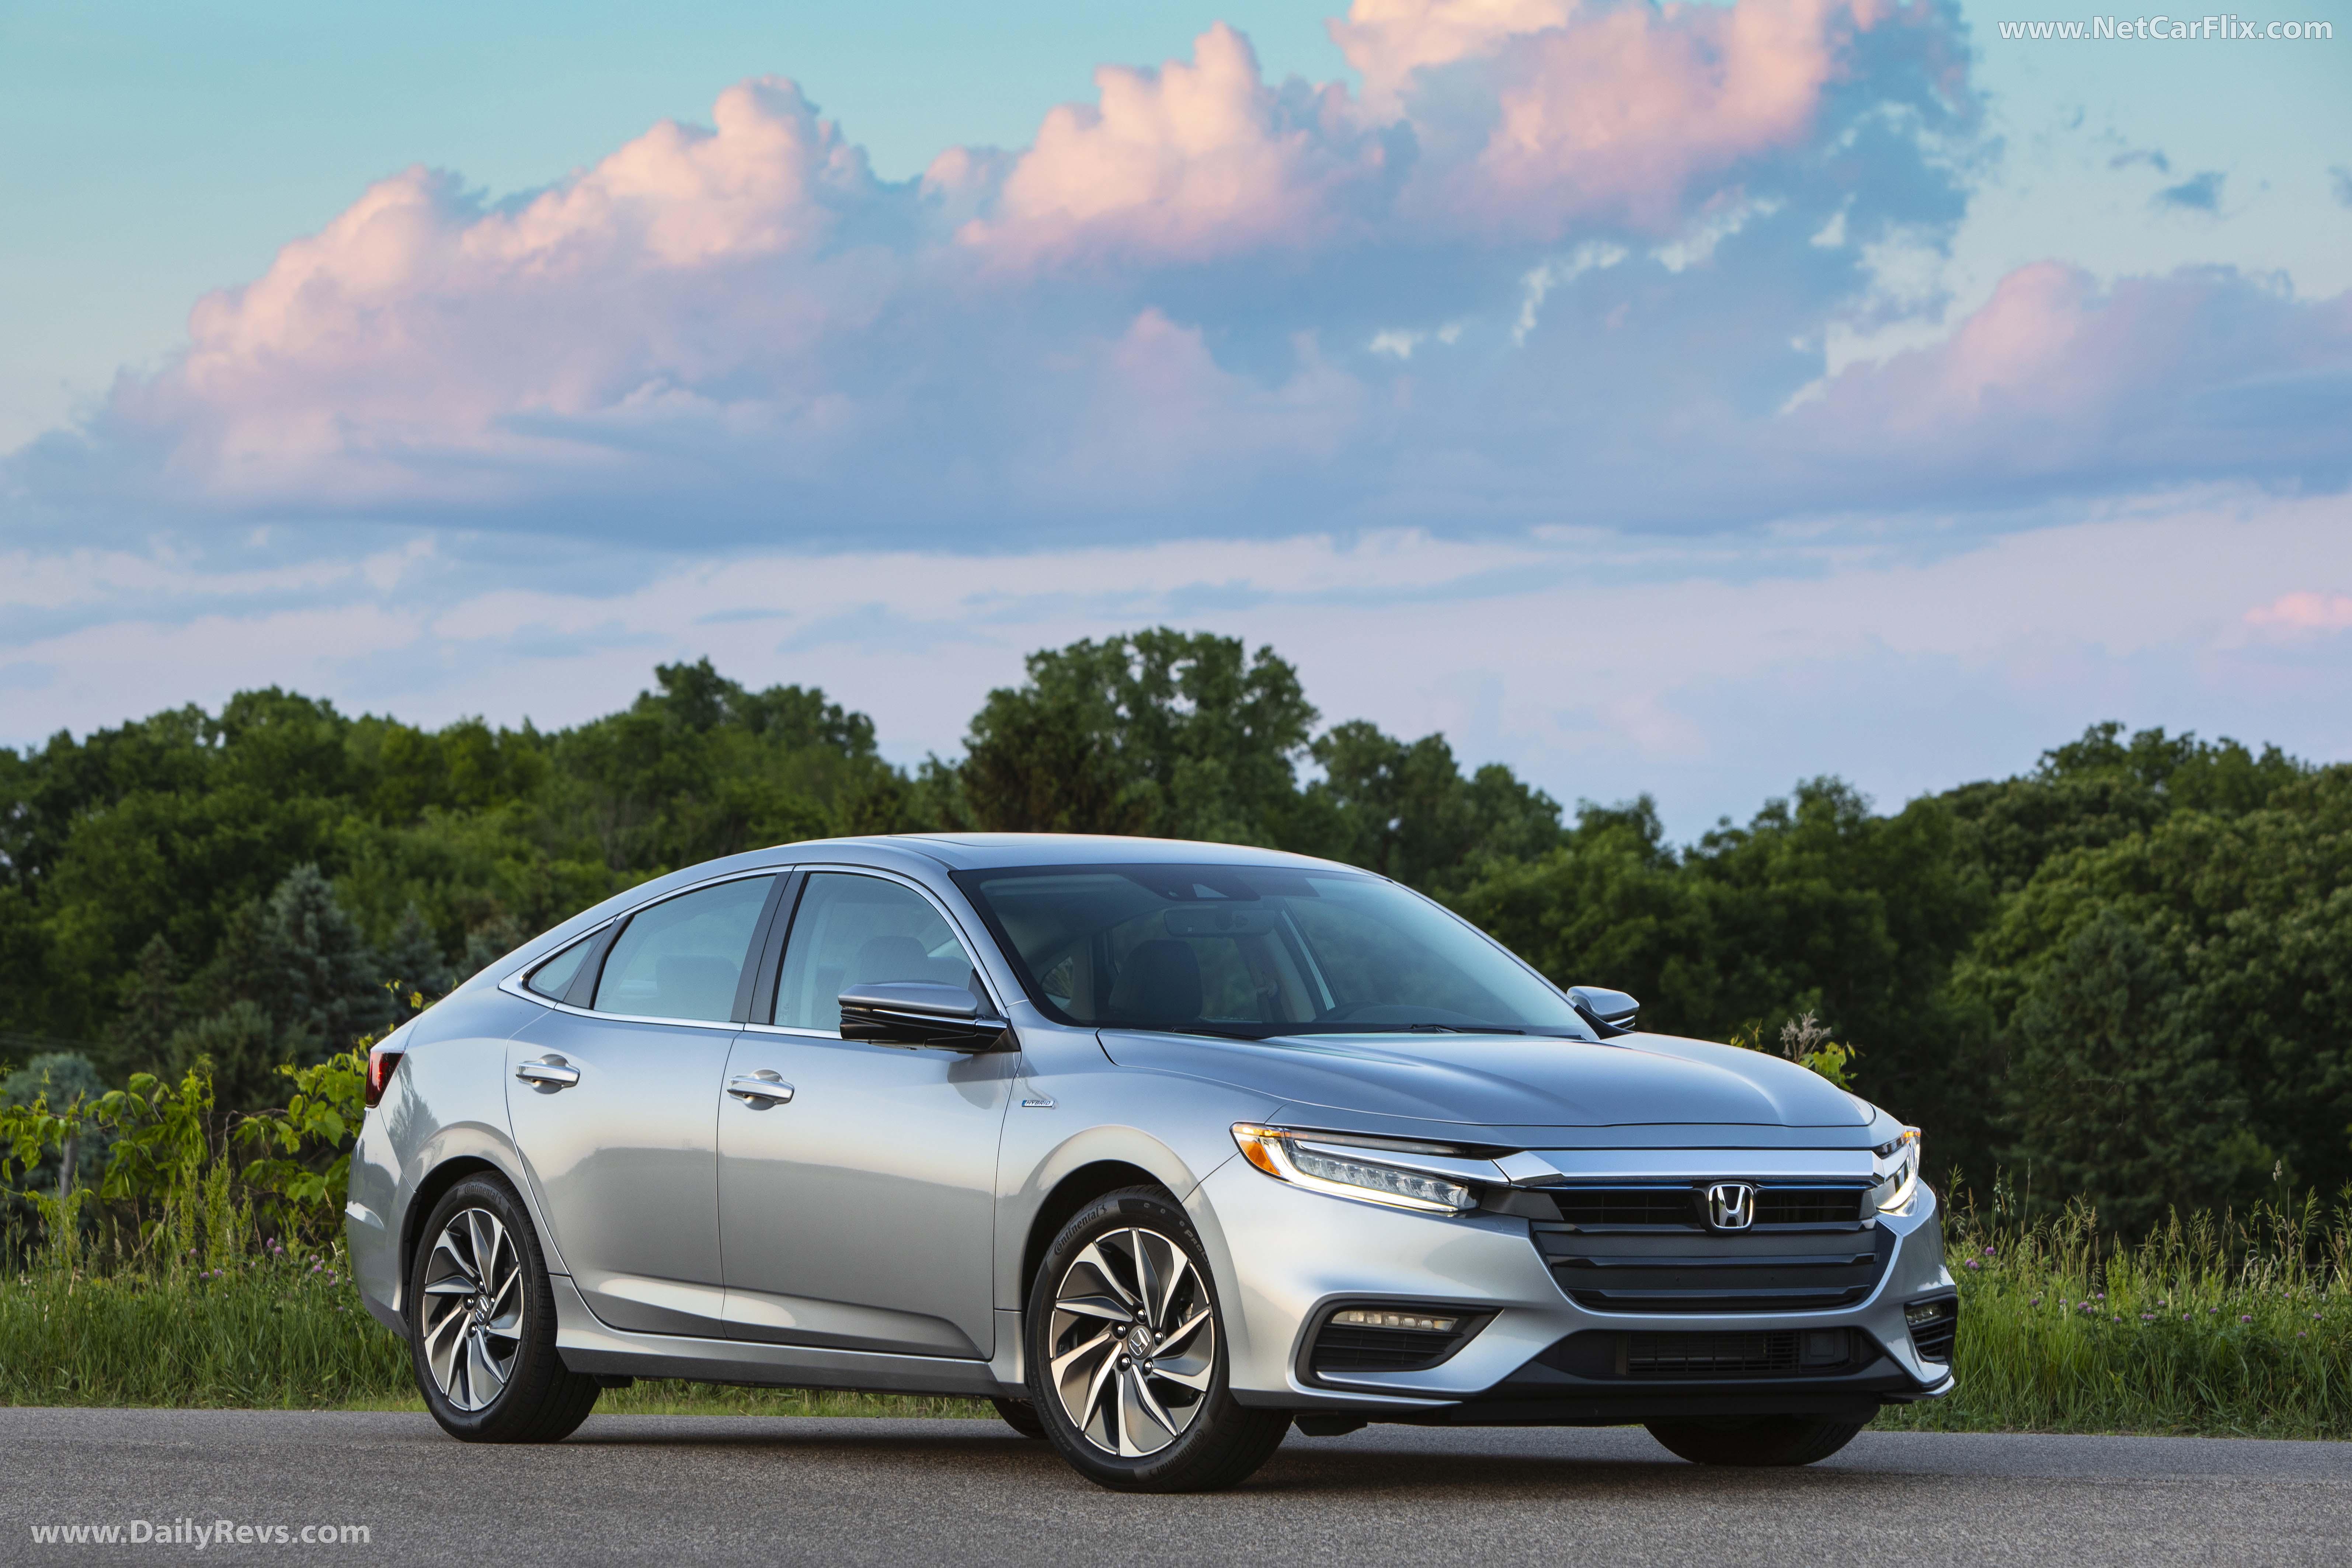 2019 Honda Insight - HD Pictures, Videos, Specs ...